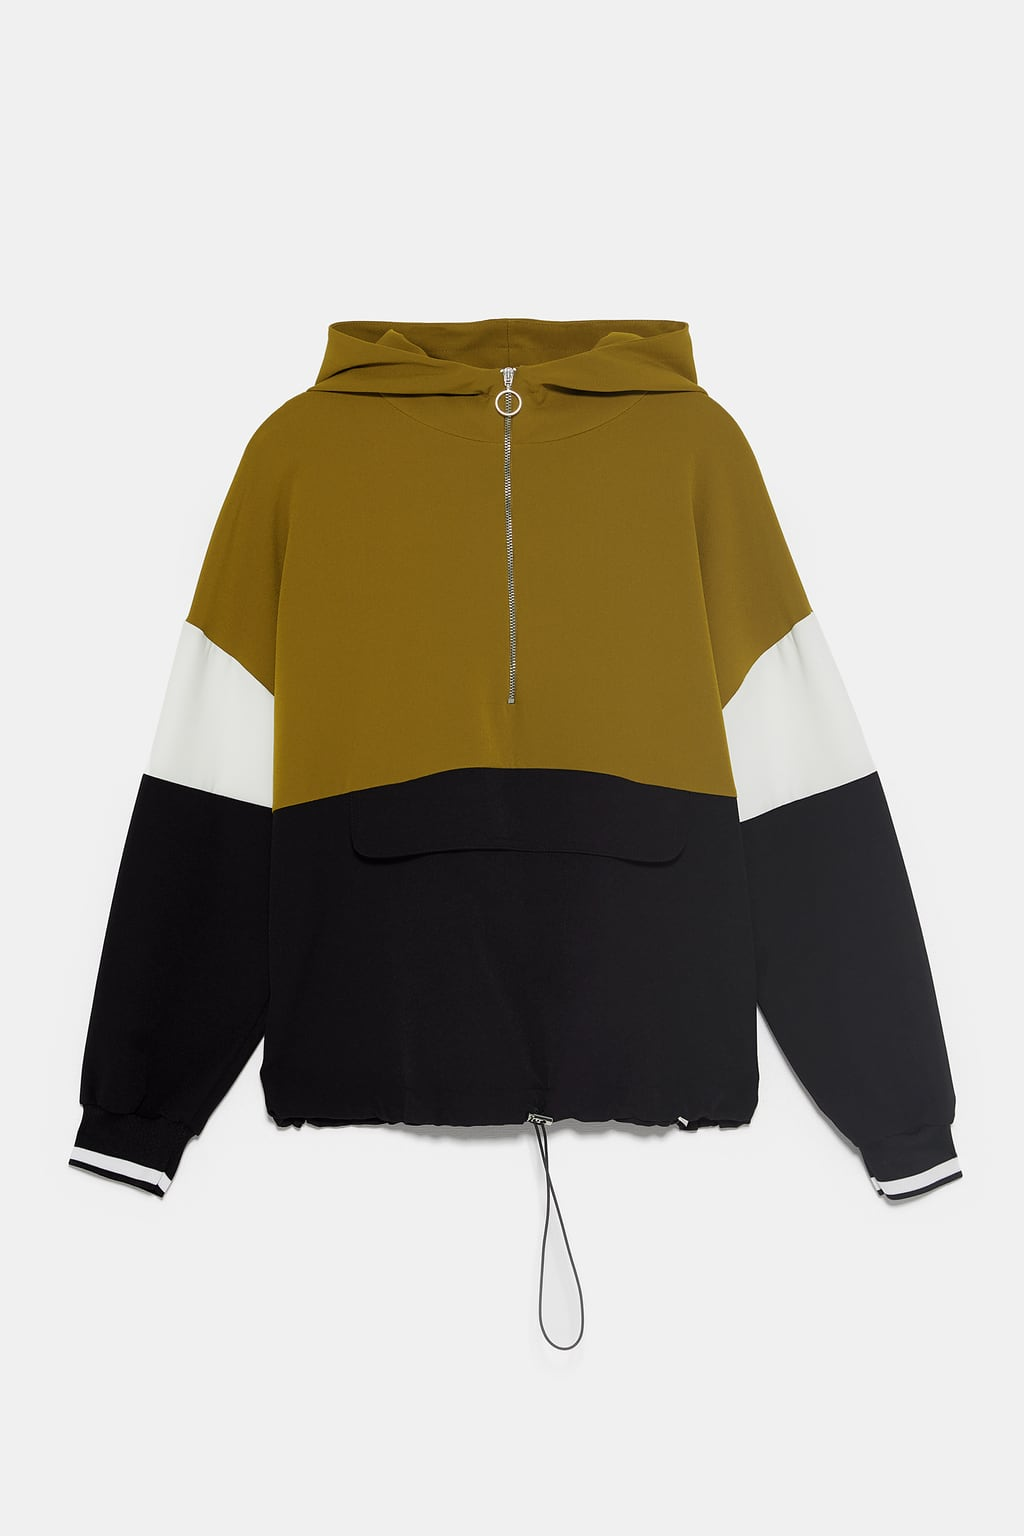 hoodie in jack stijl